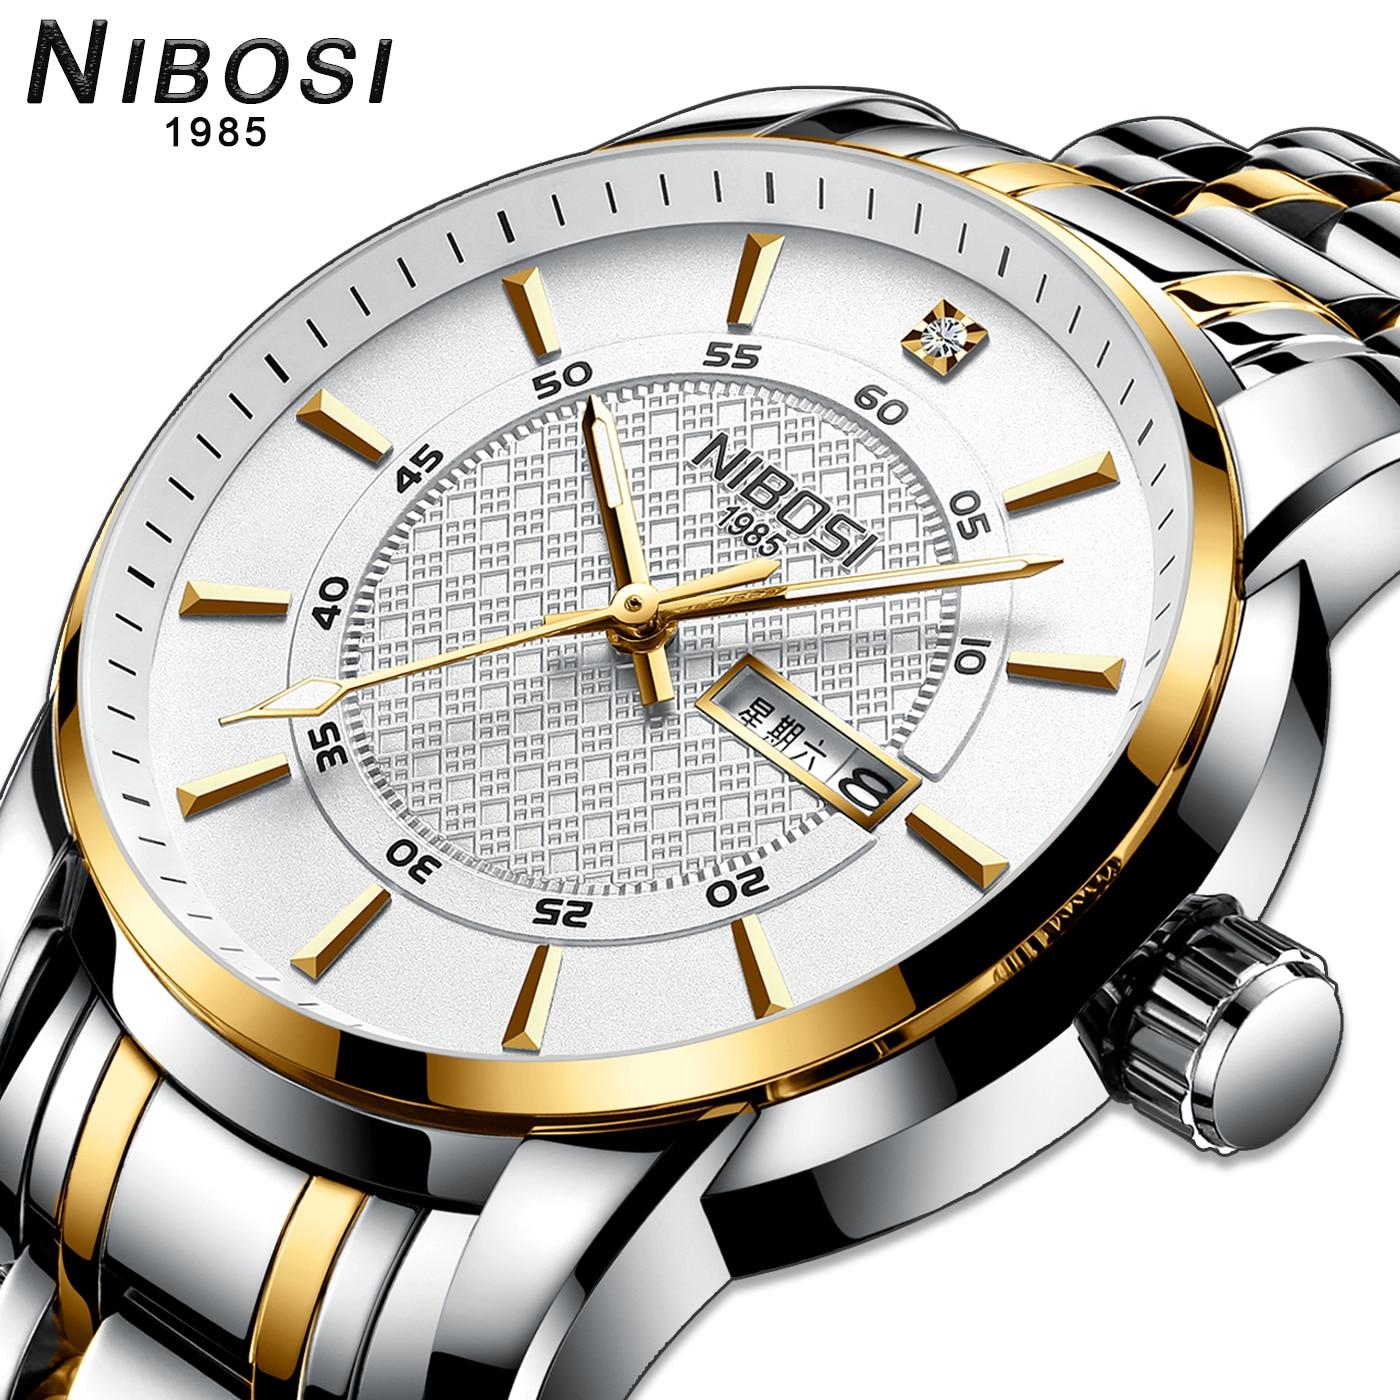 NIBOSI Clocks men's Quartz wrist watch men fashion watches tops Luxury brand business waterproof wristwatches Relogio Masculino